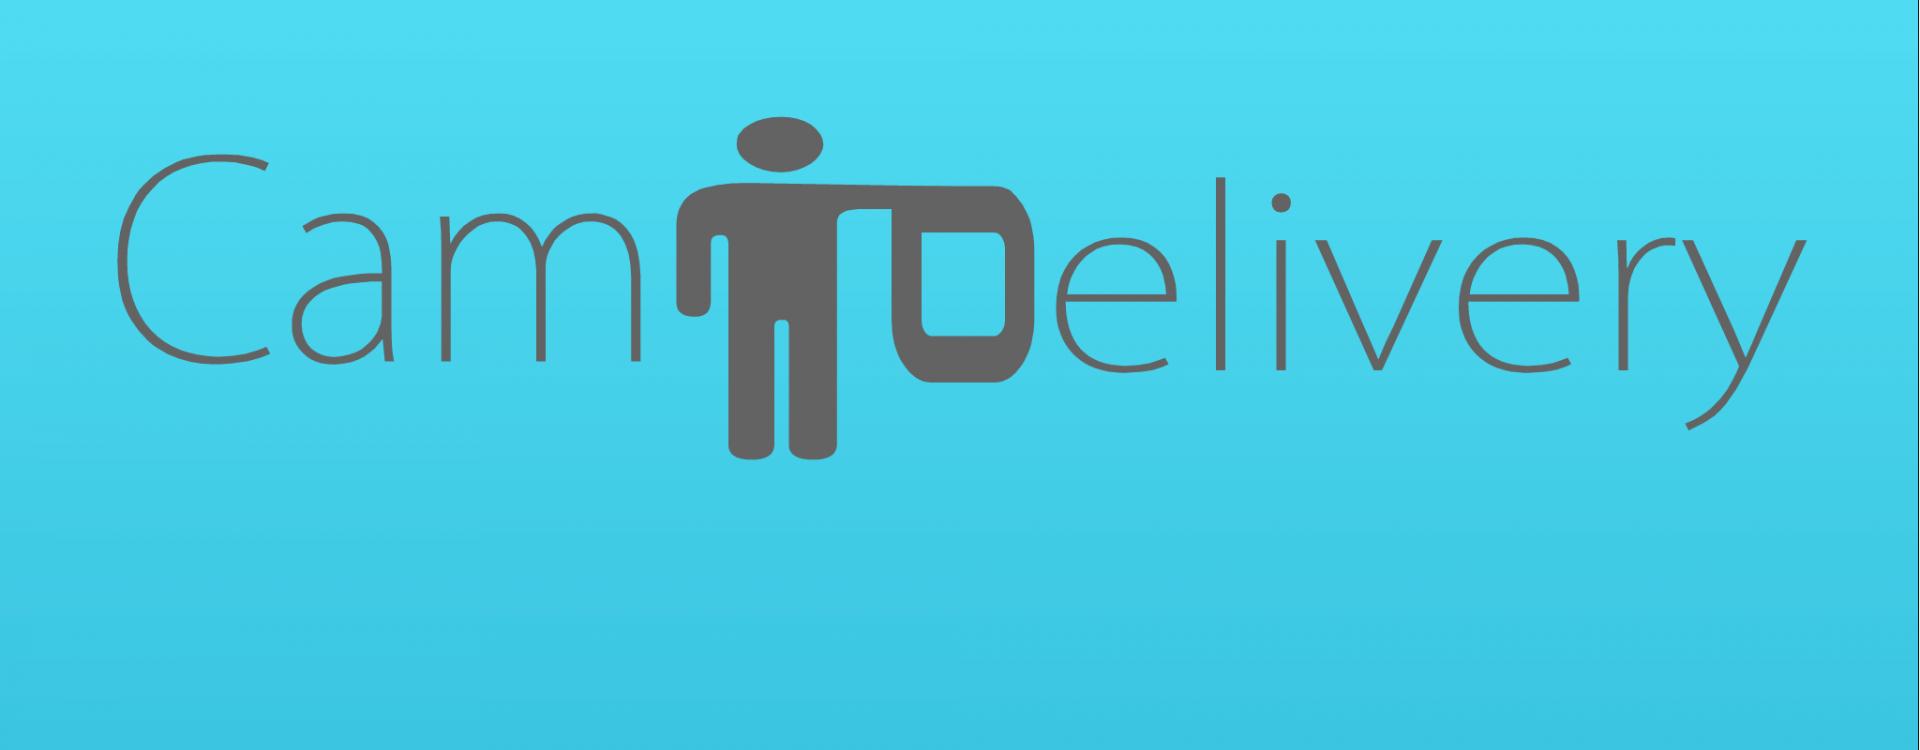 Delivery Service Website Customized Logo Design